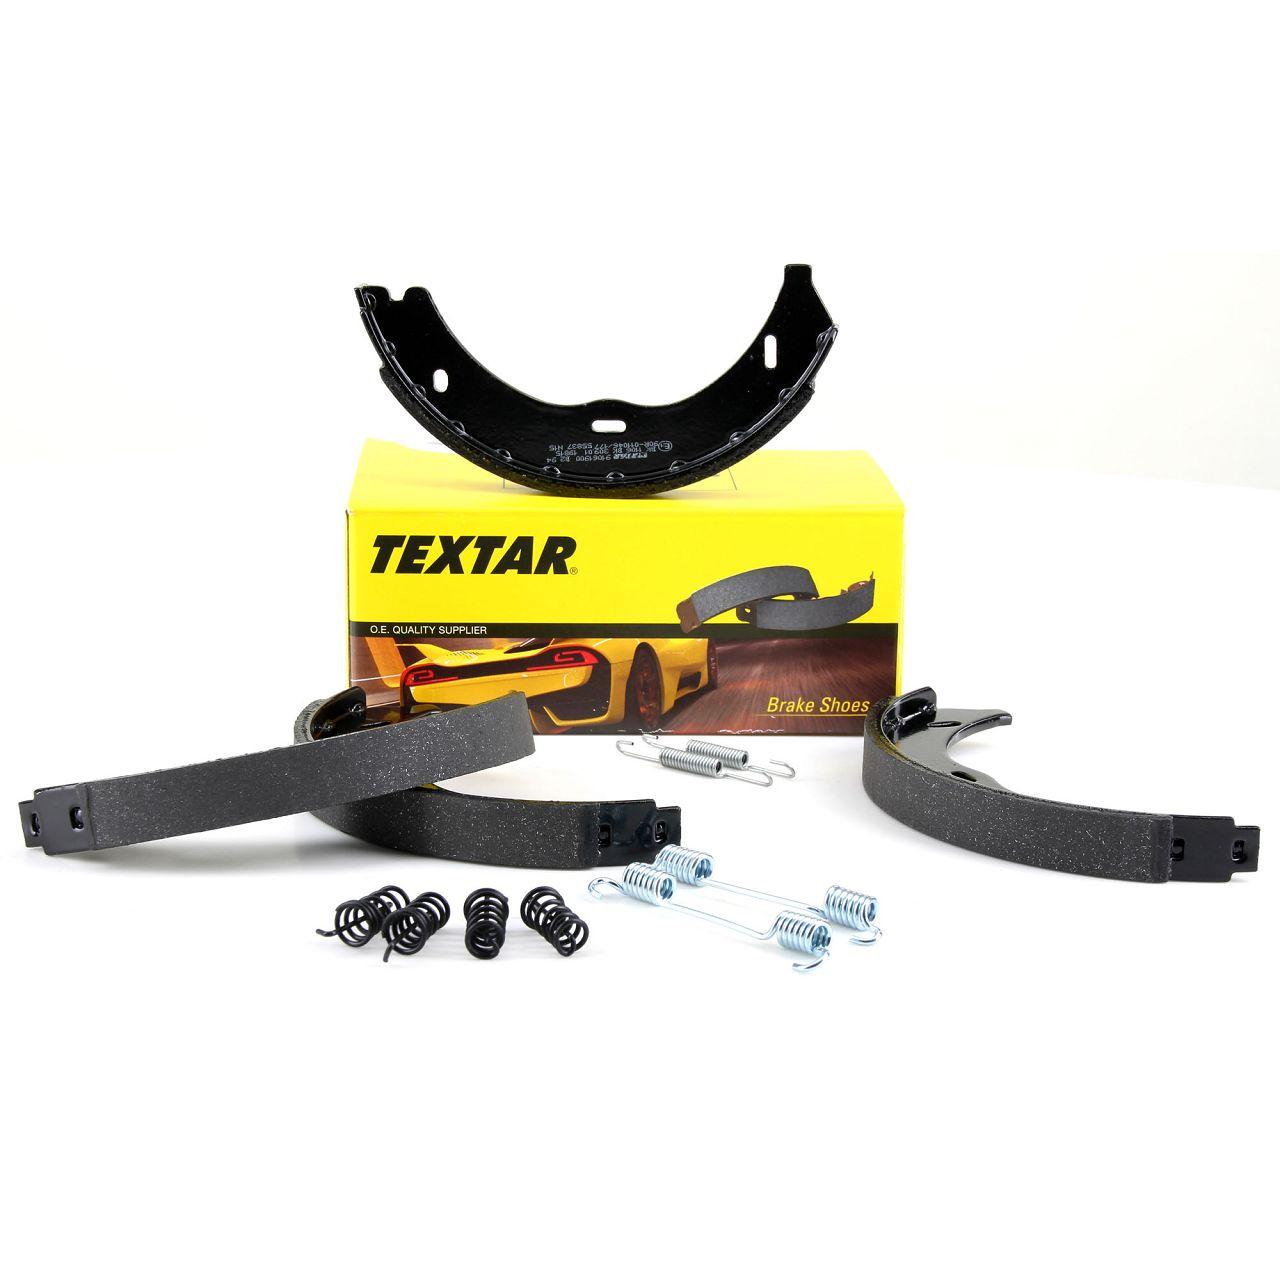 TEXTAR 91061900 Bremsbacken + Zubehör Satz MERCEDES V-Klasse Viano Vito / Mixto W639 W447